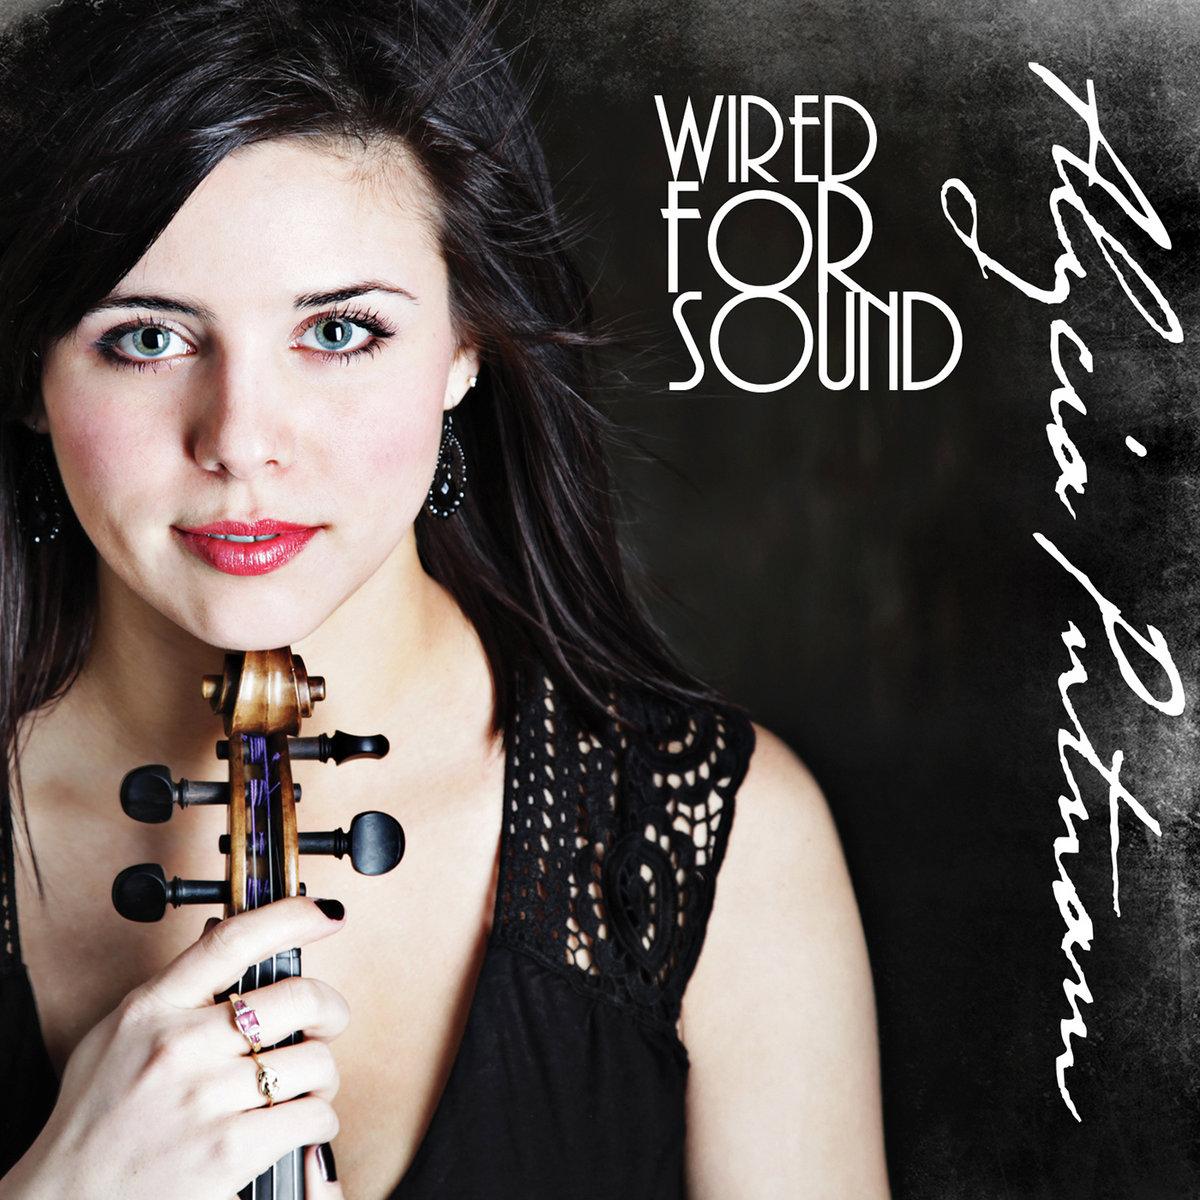 Wired for Sound | Alycia Putnam